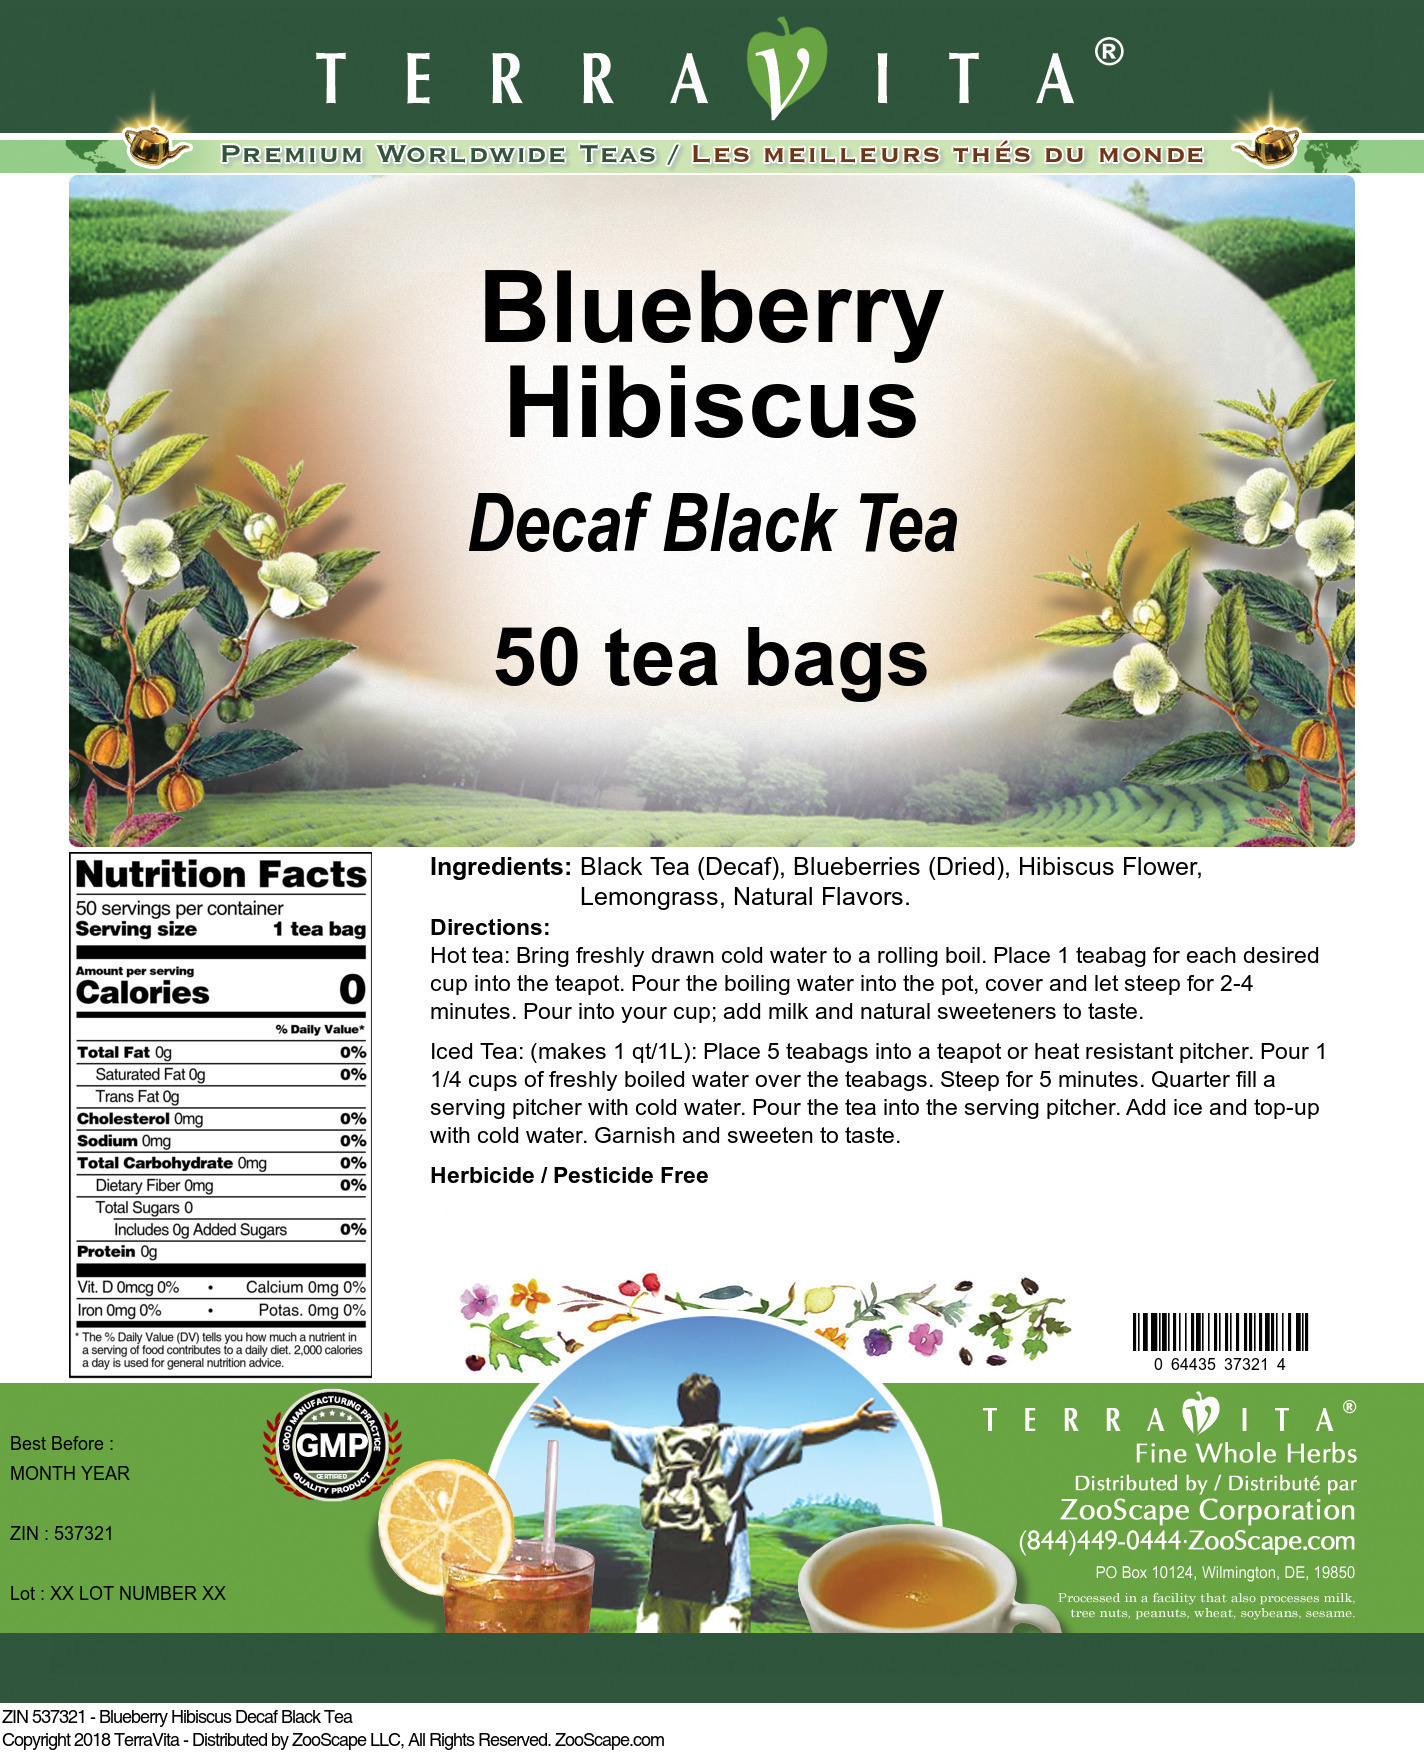 Blueberry Hibiscus Decaf Black Tea